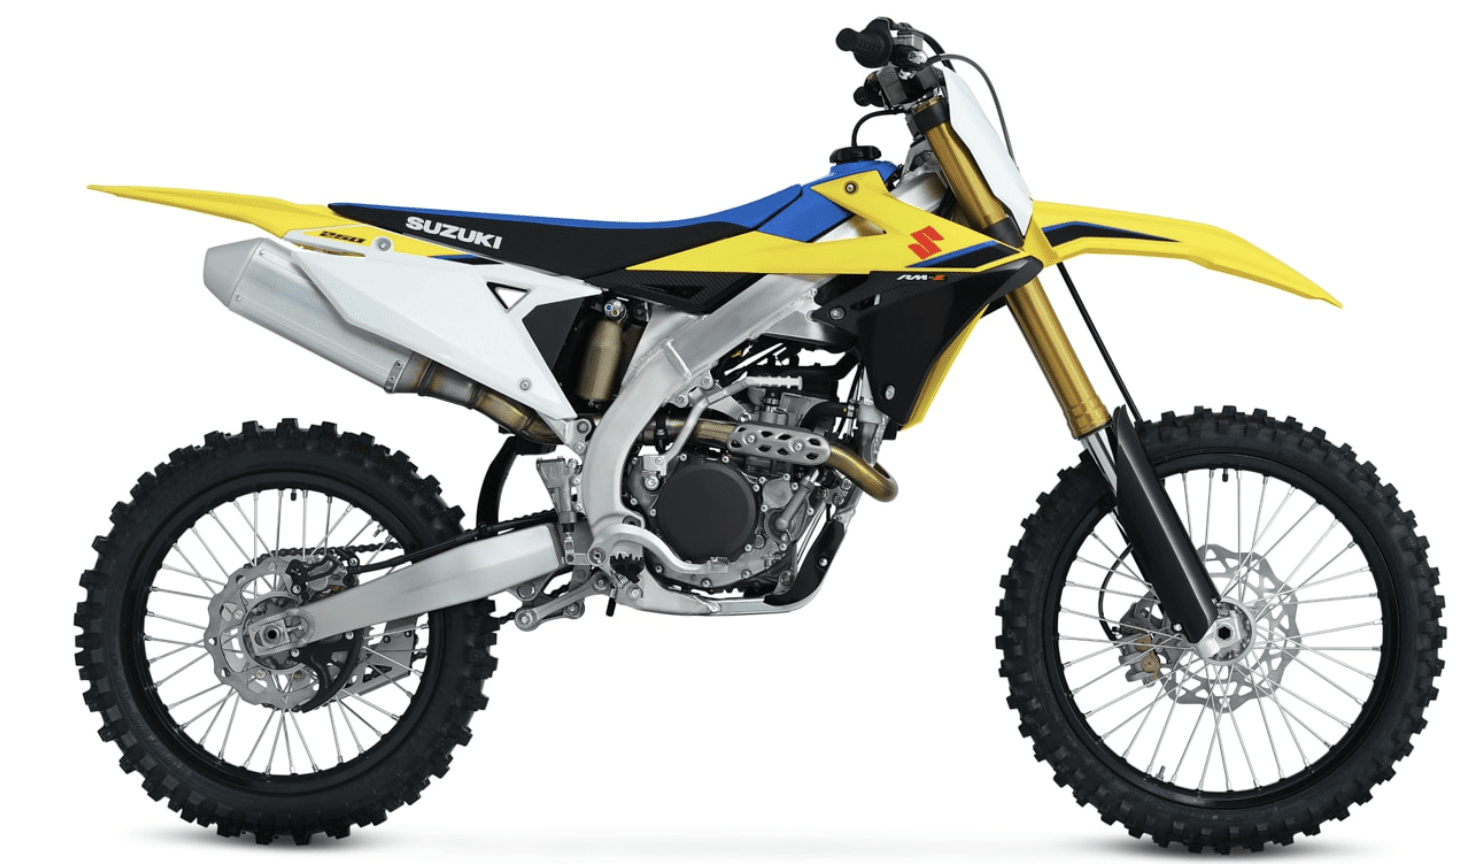 2020 Suzuki RMZ450